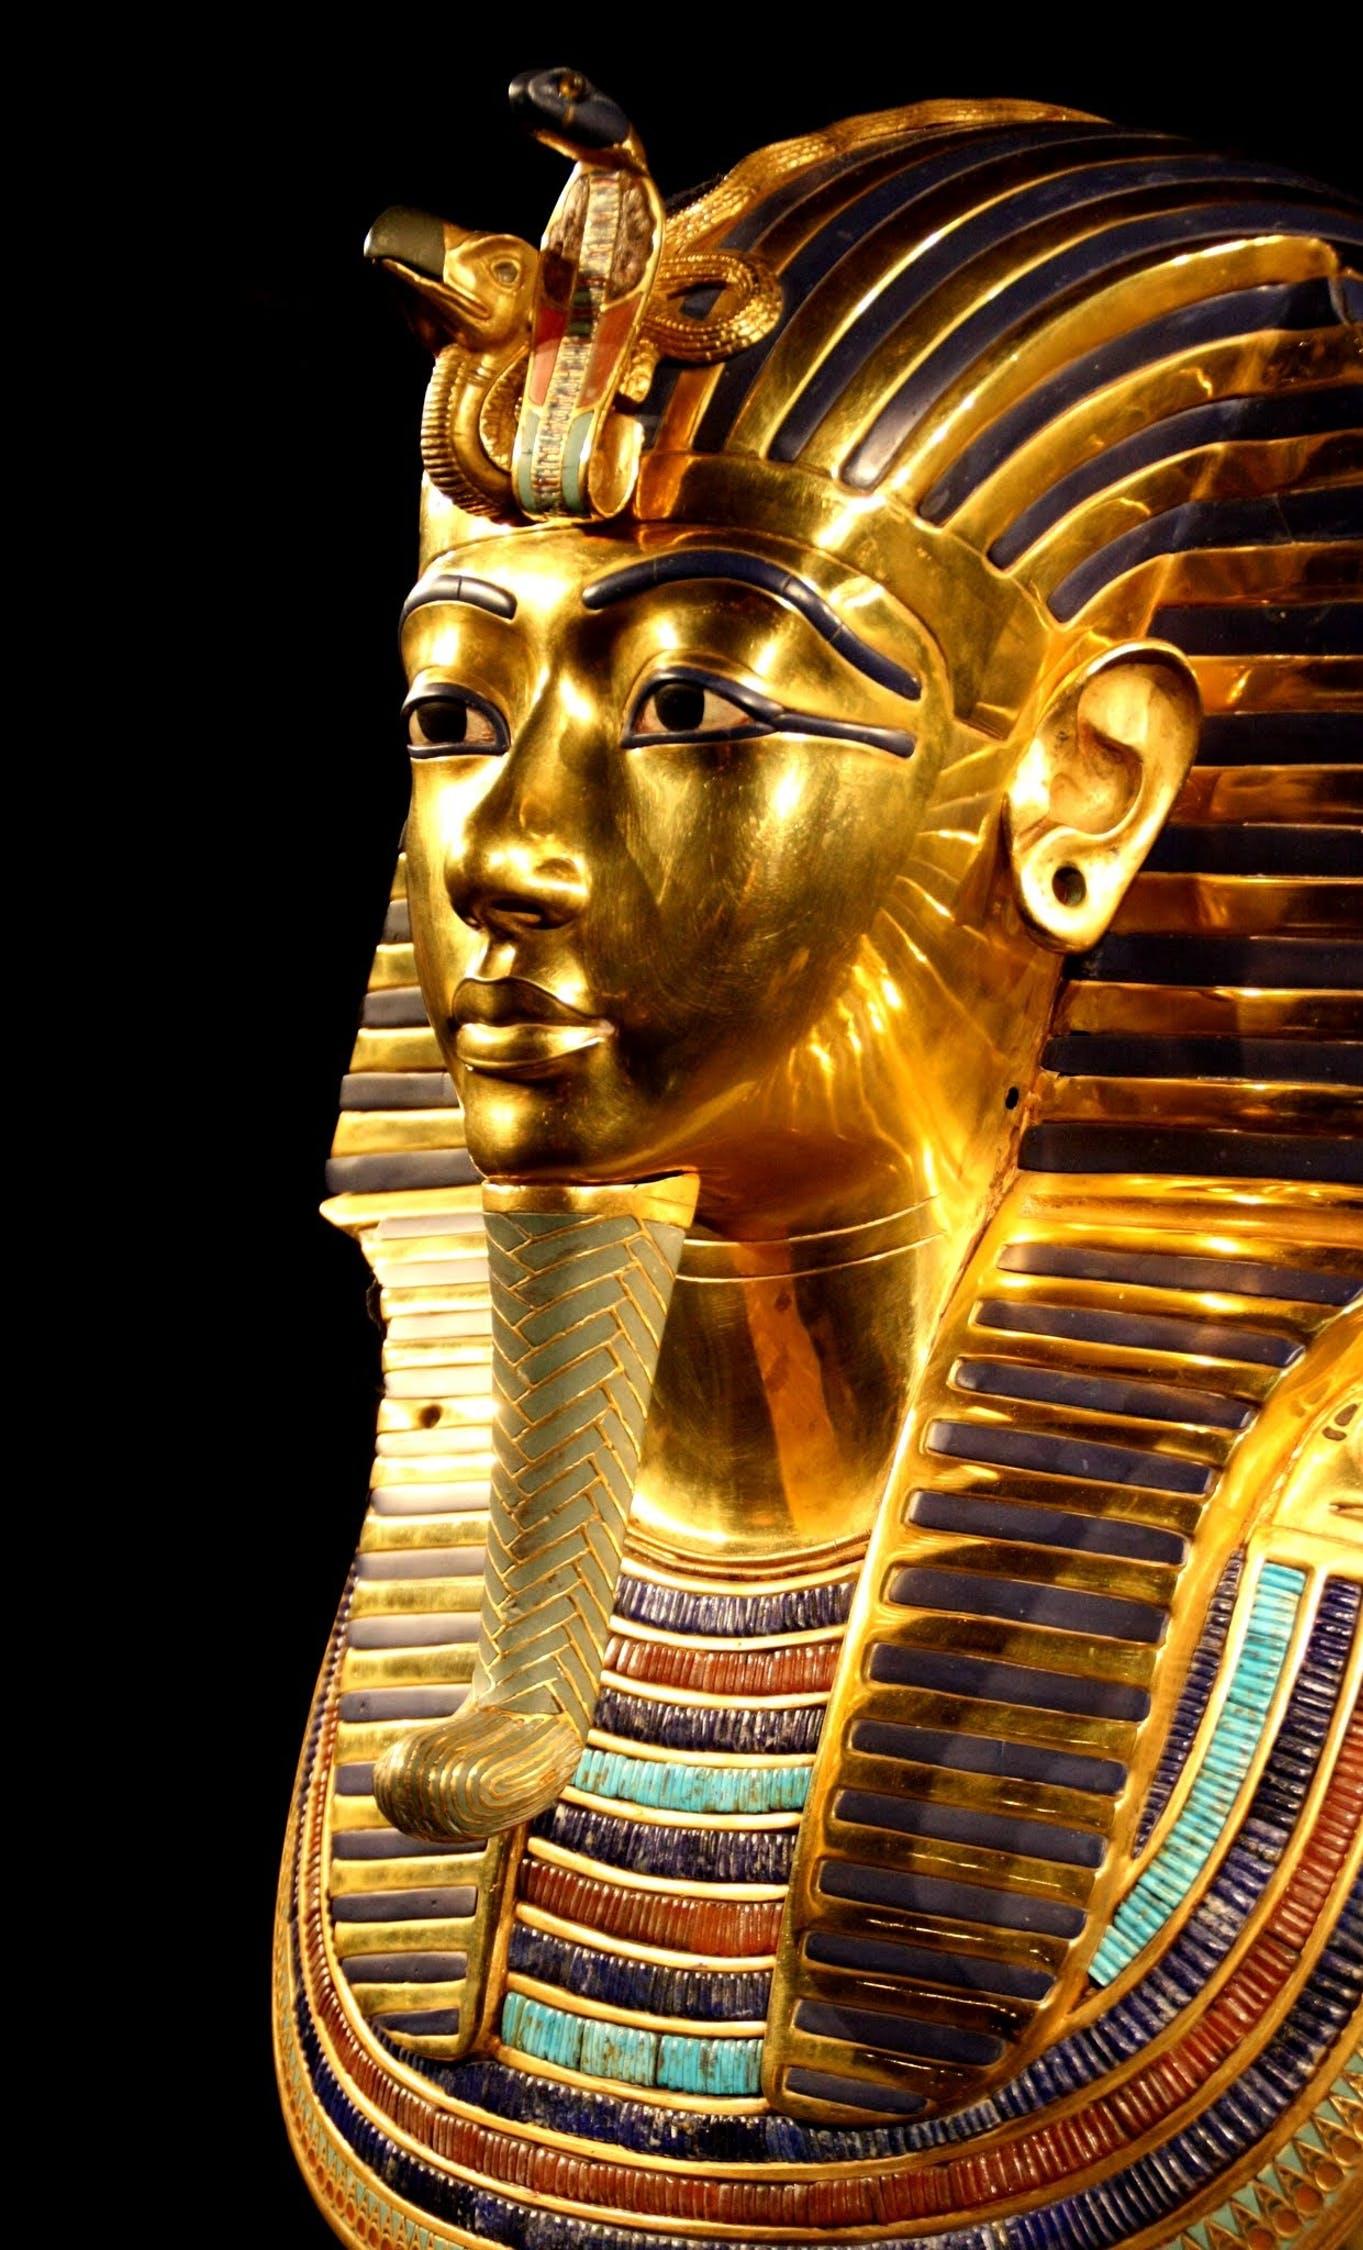 The death mask of King Tutankhamun, a prominent pharaoh.